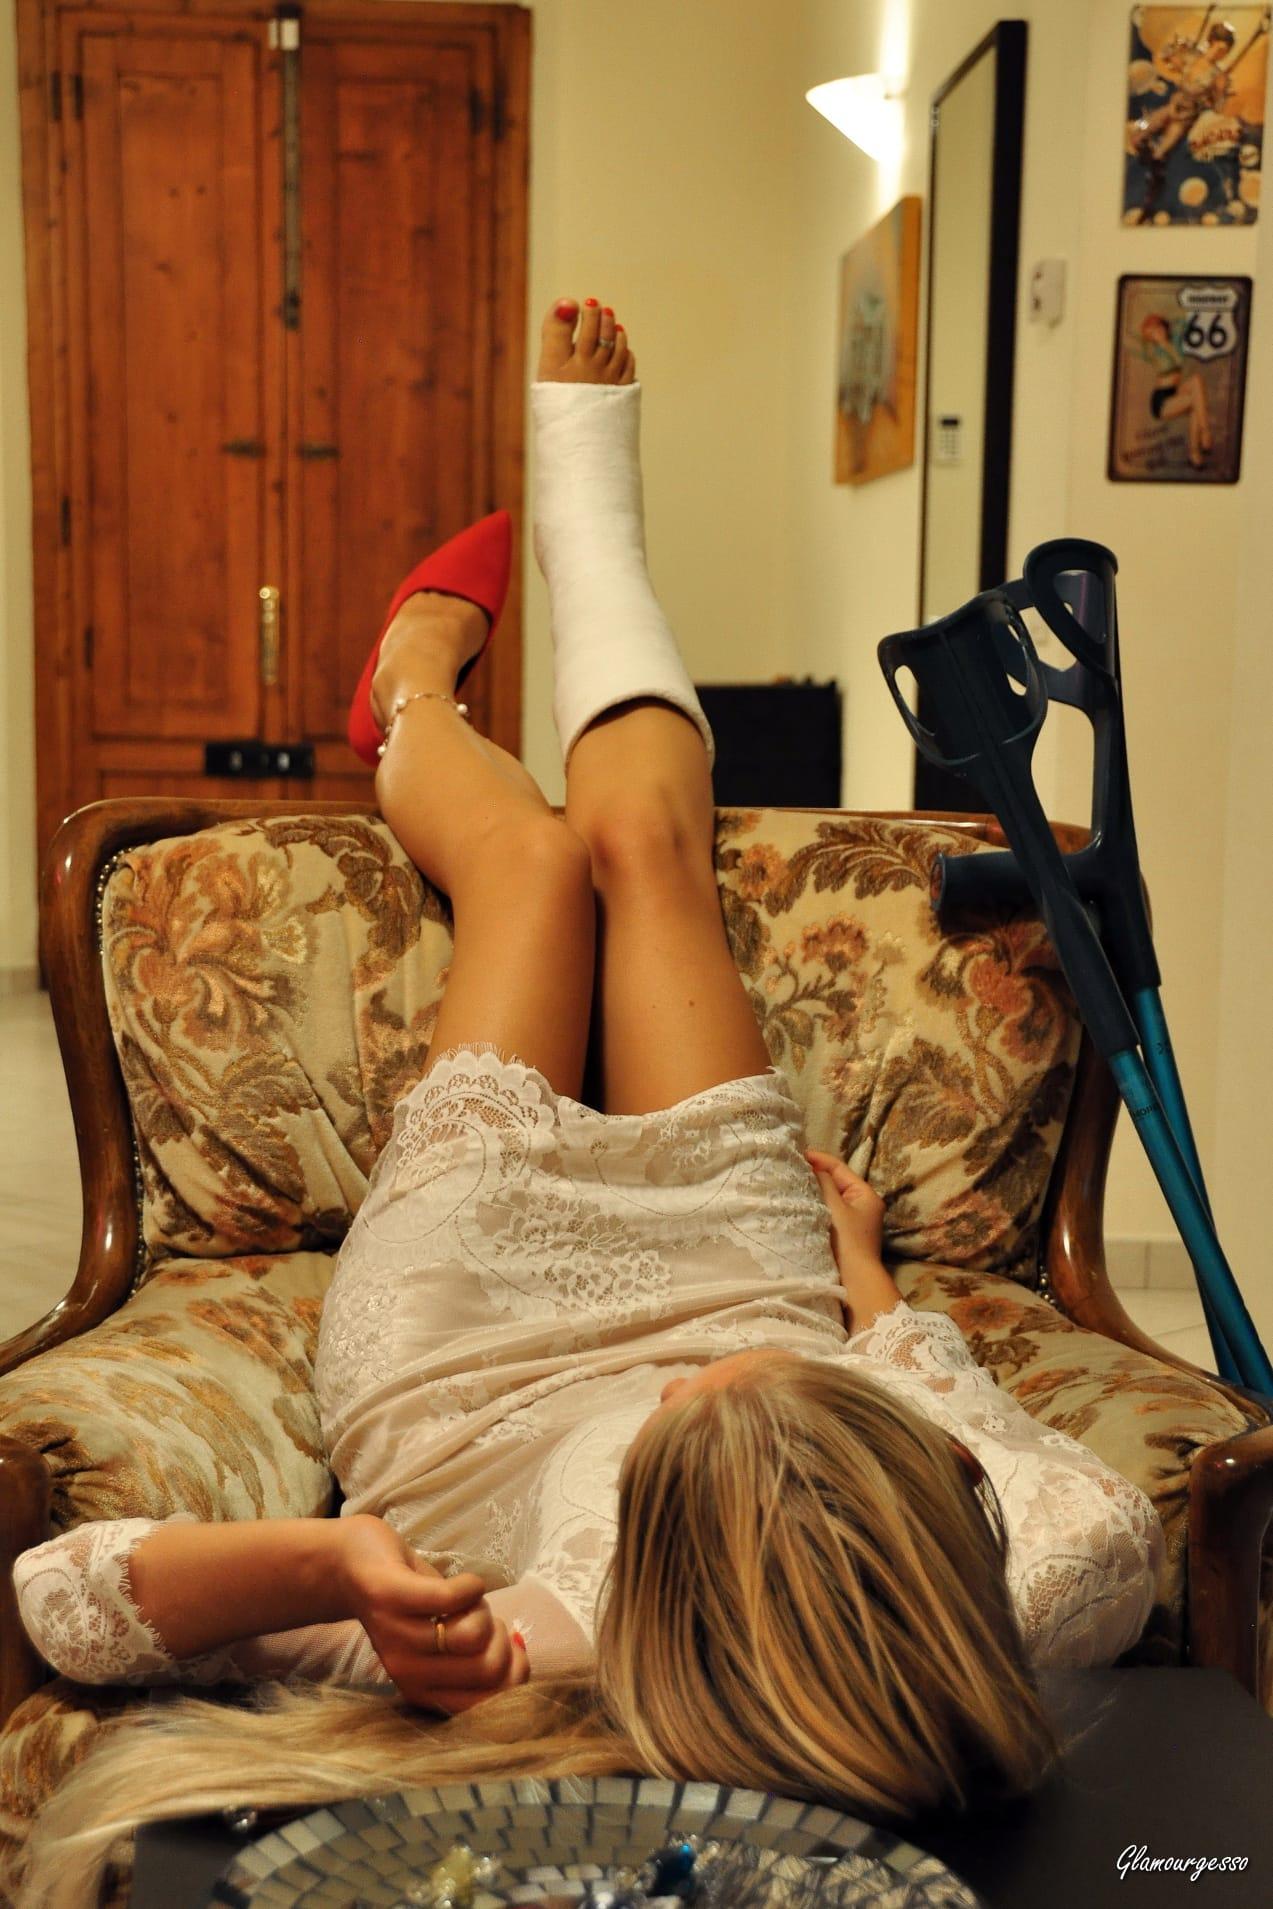 SVITLANA 5 days SLC - Ukrainian professional model Svitlana wears her Long-Term SLC, showing you her attitude on crutches in variuos feminine outfits.